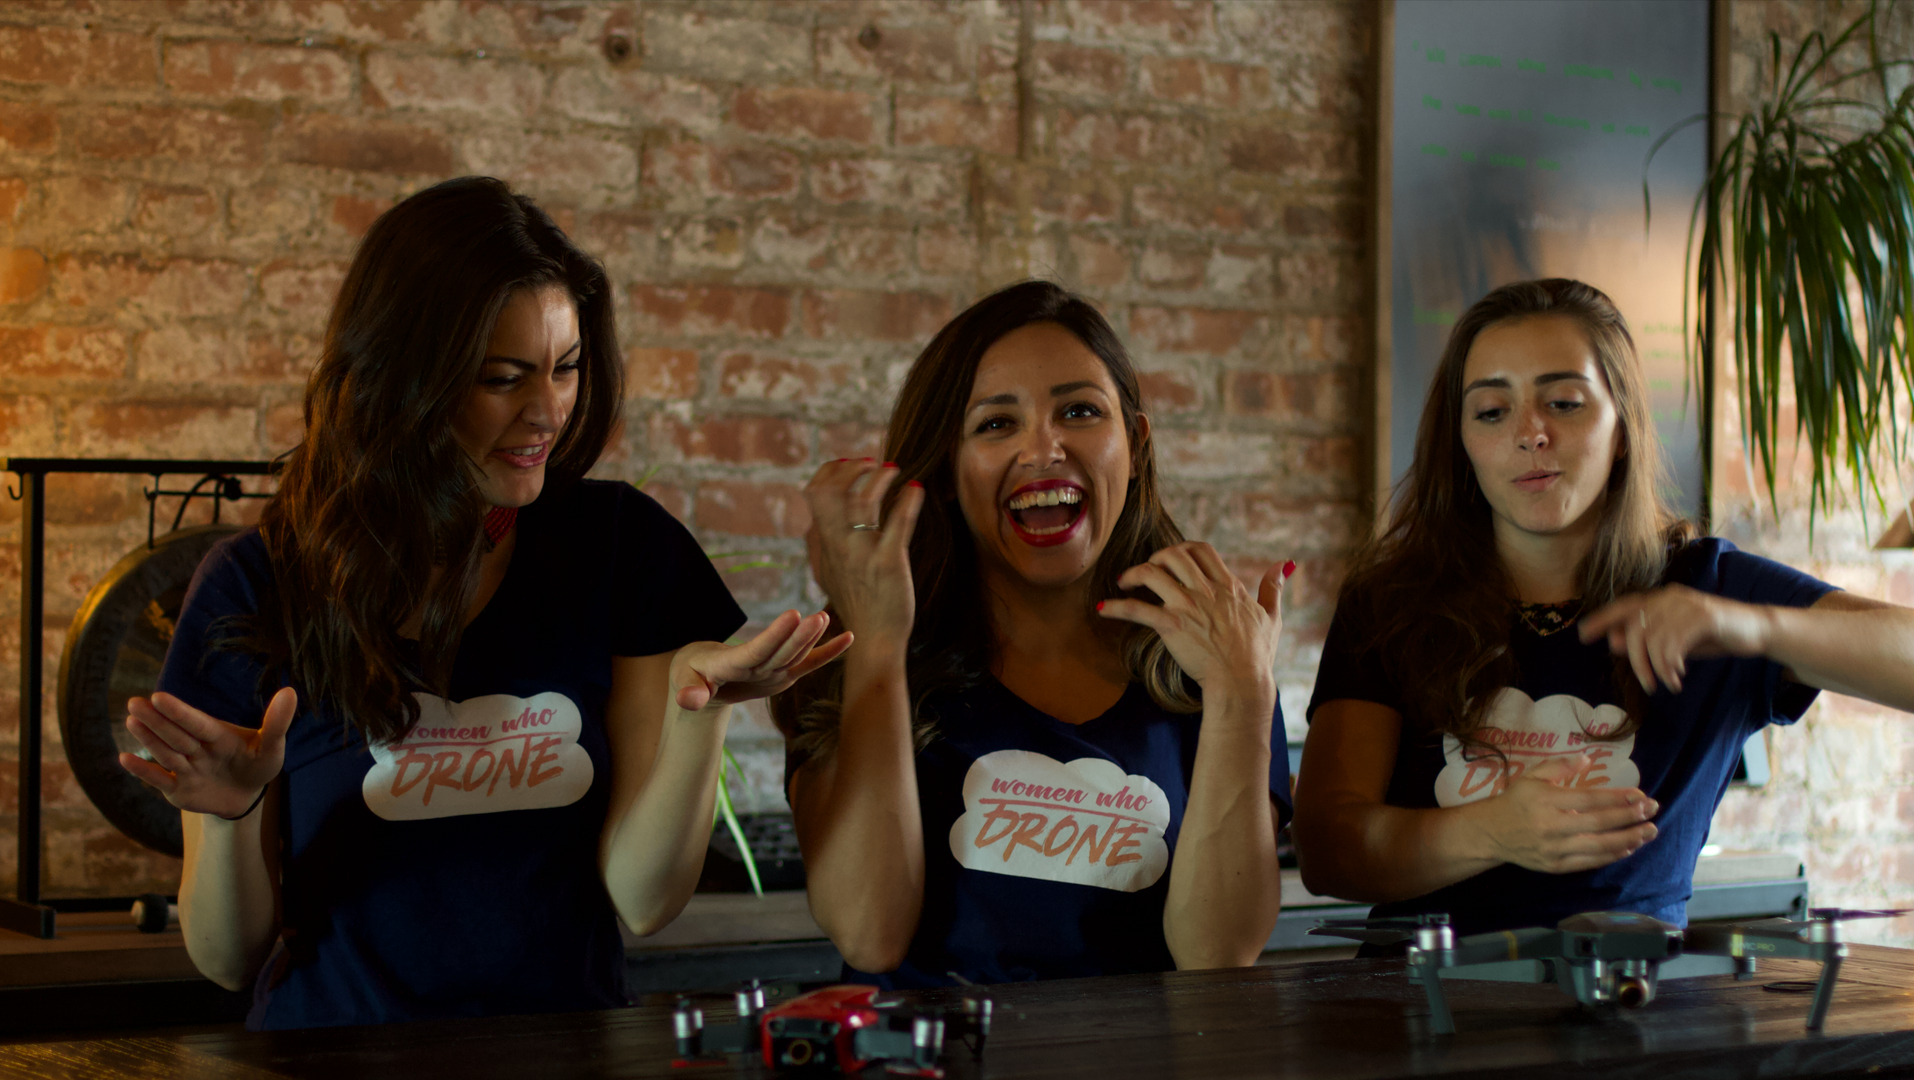 women who drone original members